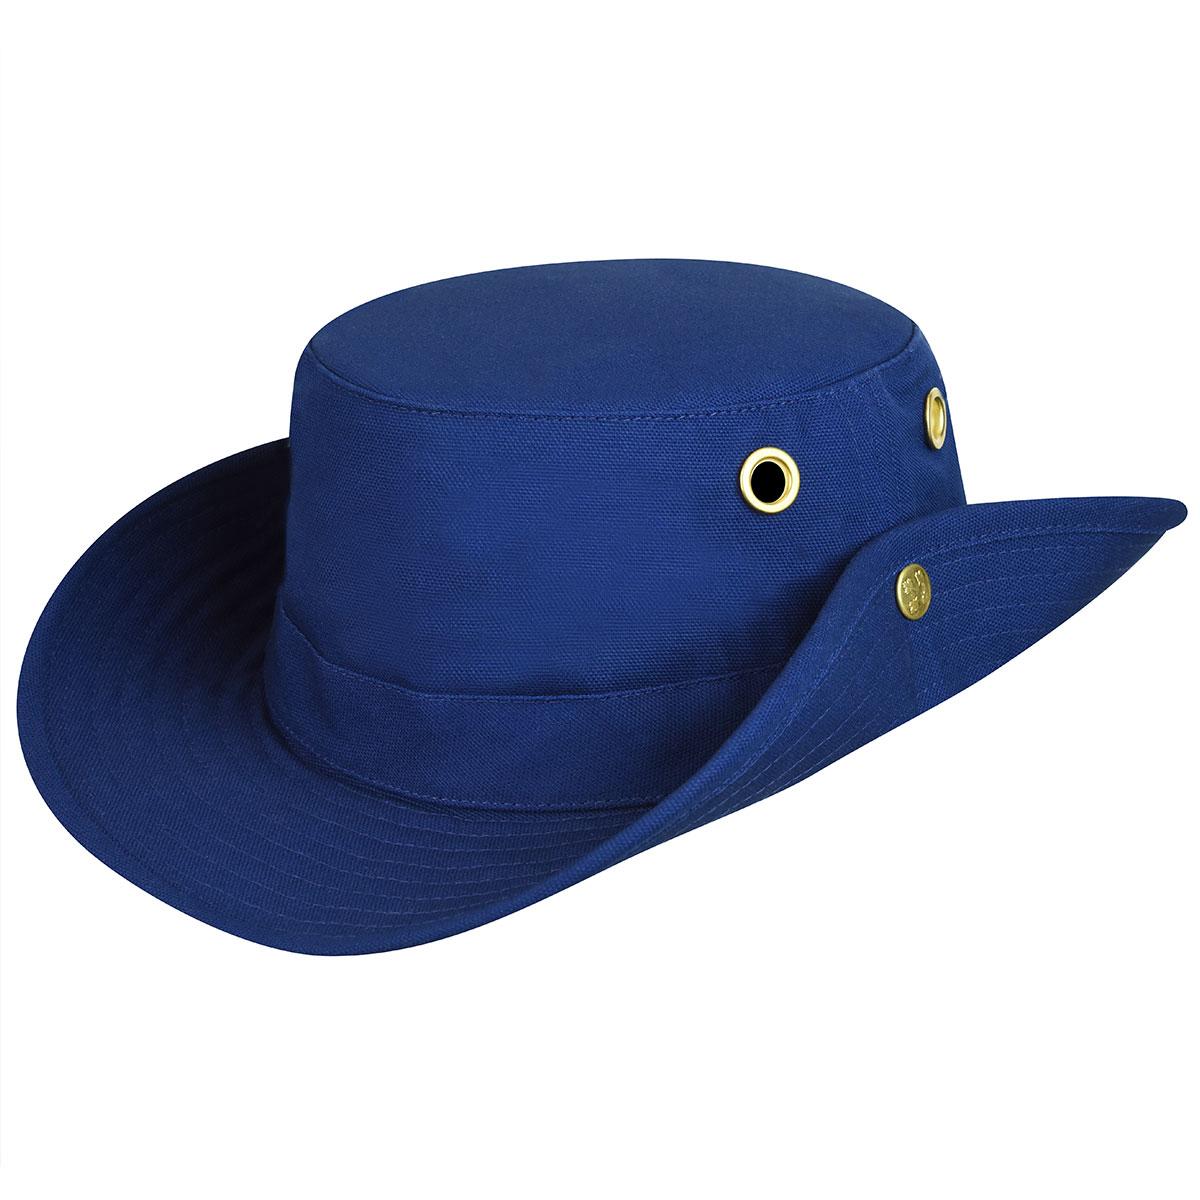 Tilley Tilley Cotton Duck Hat in Royal Navy